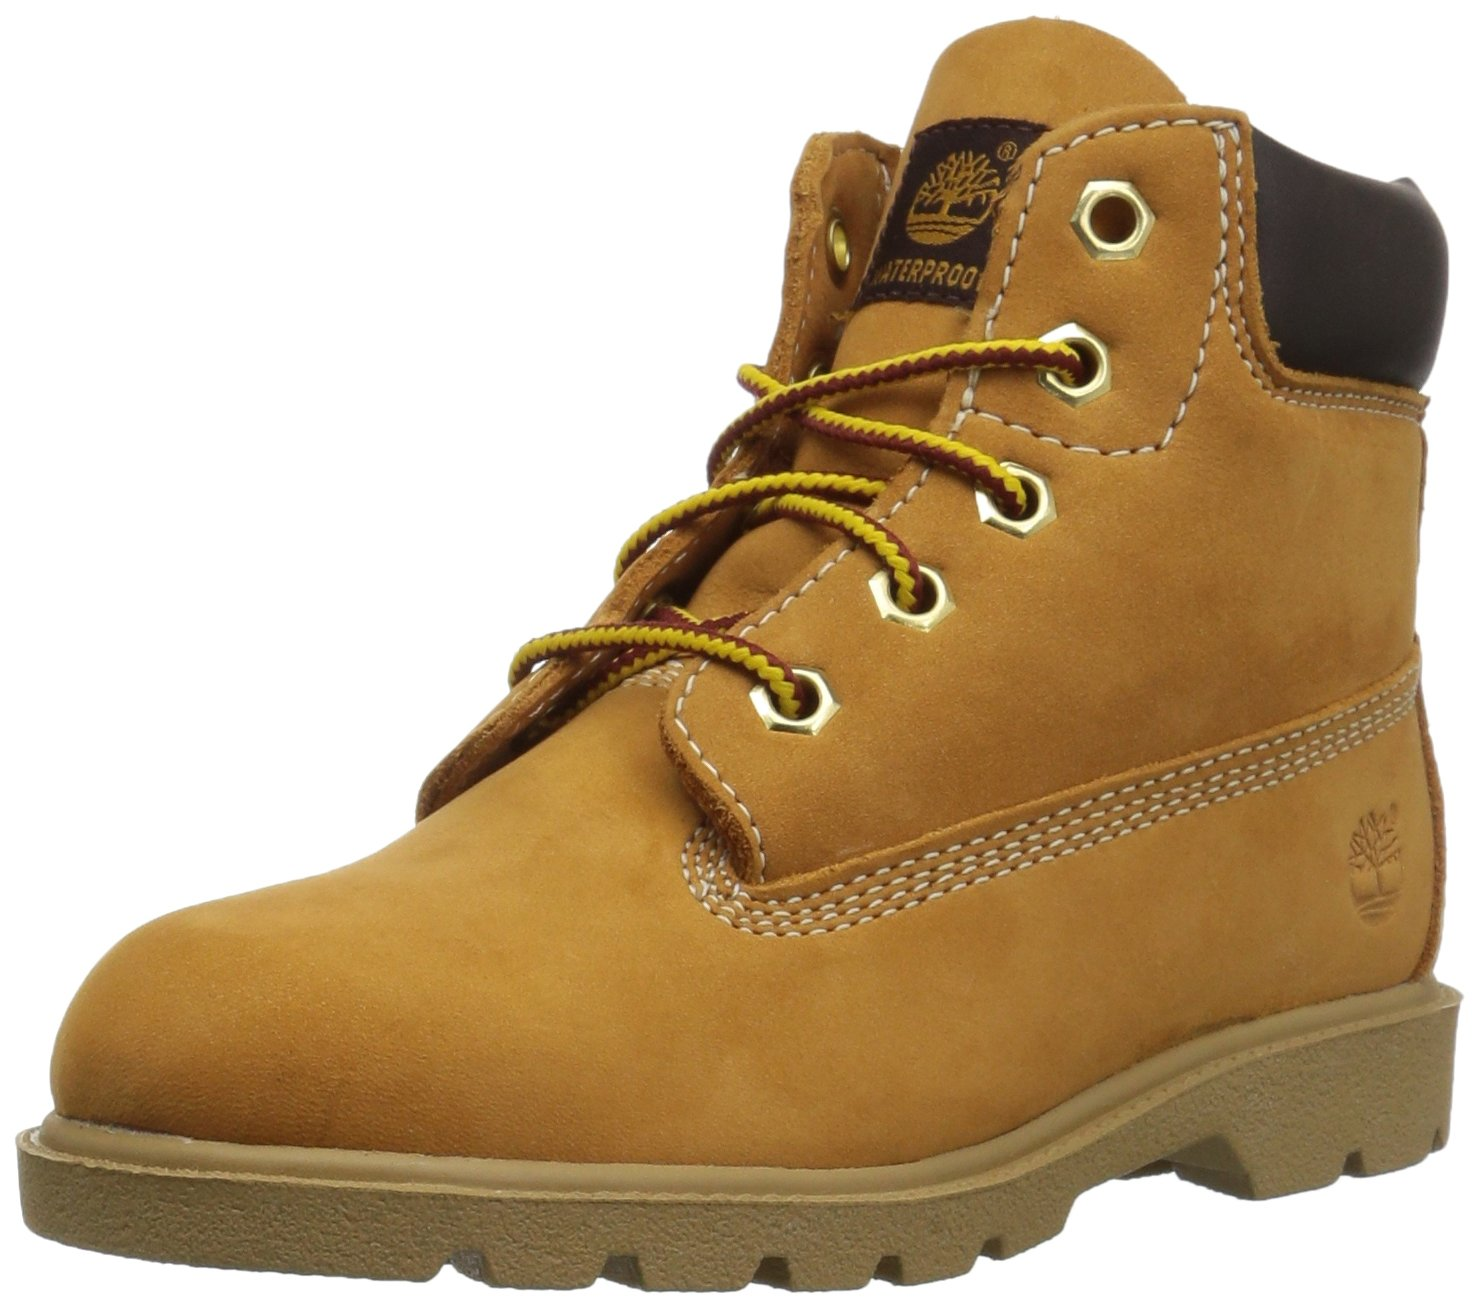 Timberland Unisex 6 in Classic Boot Ankle, Wheat, 3.5 Medium US Big Kid